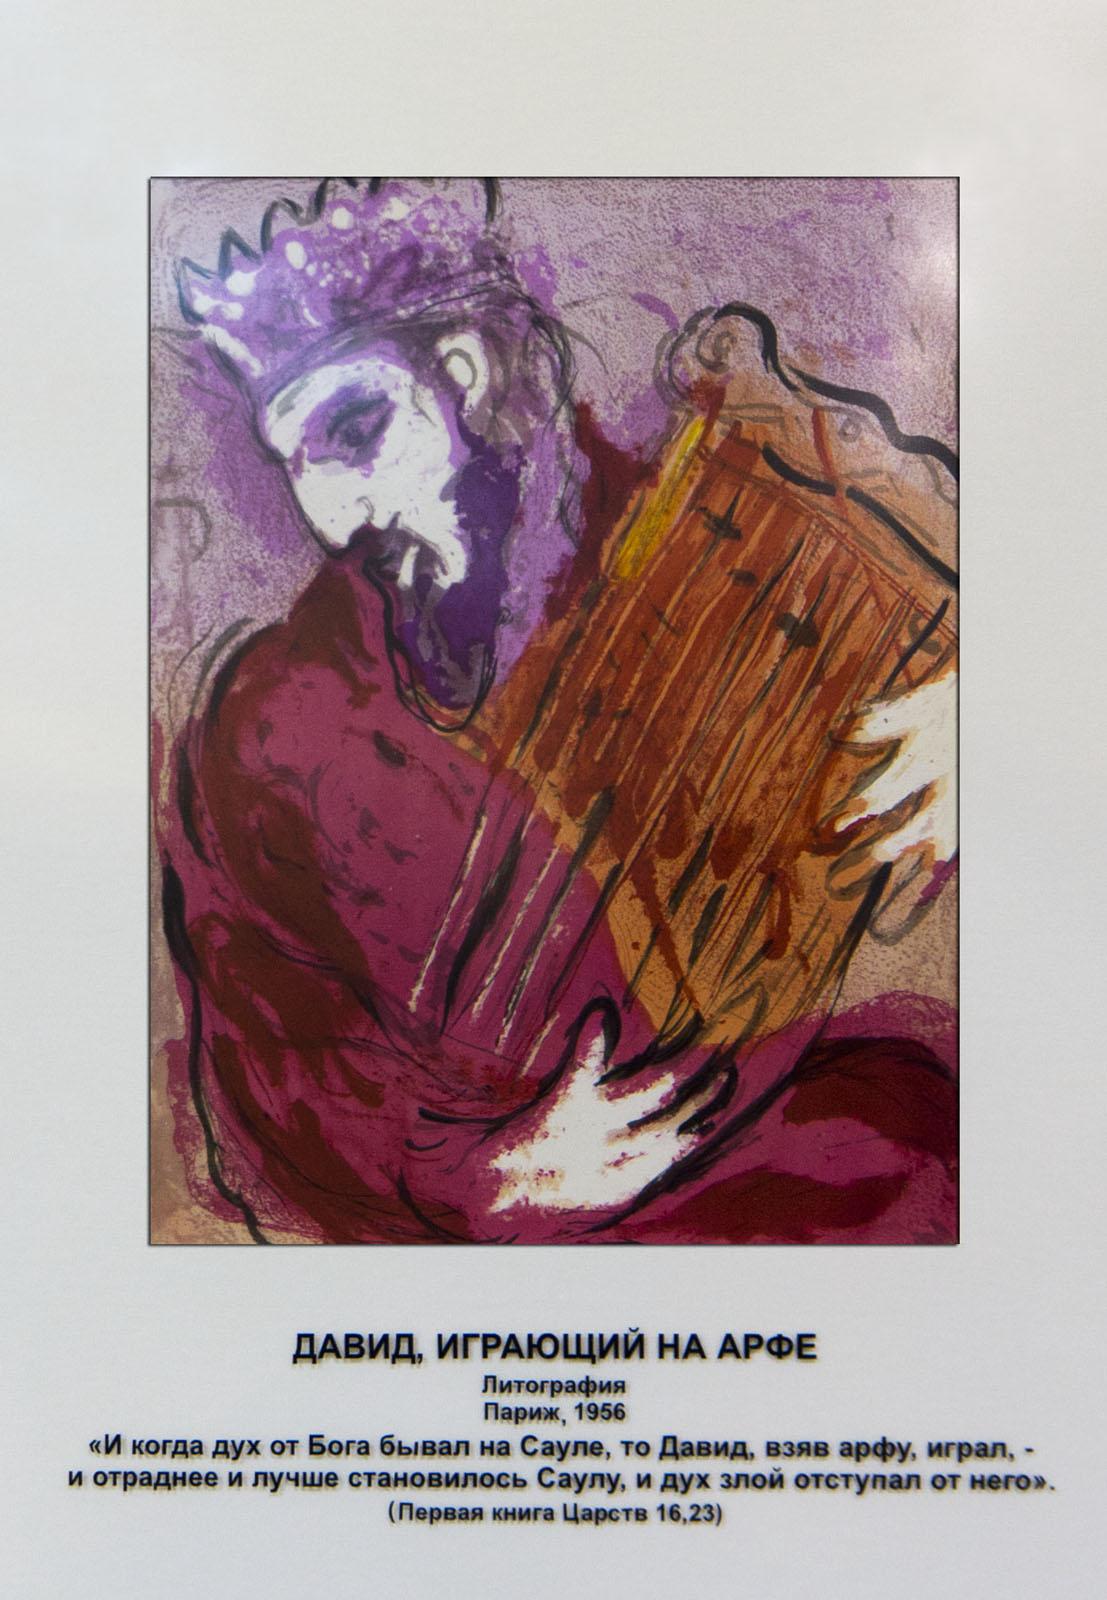 Фото №74391. «Давид, играющий на арфе», Марк Шагал, литография, Париж, 1956